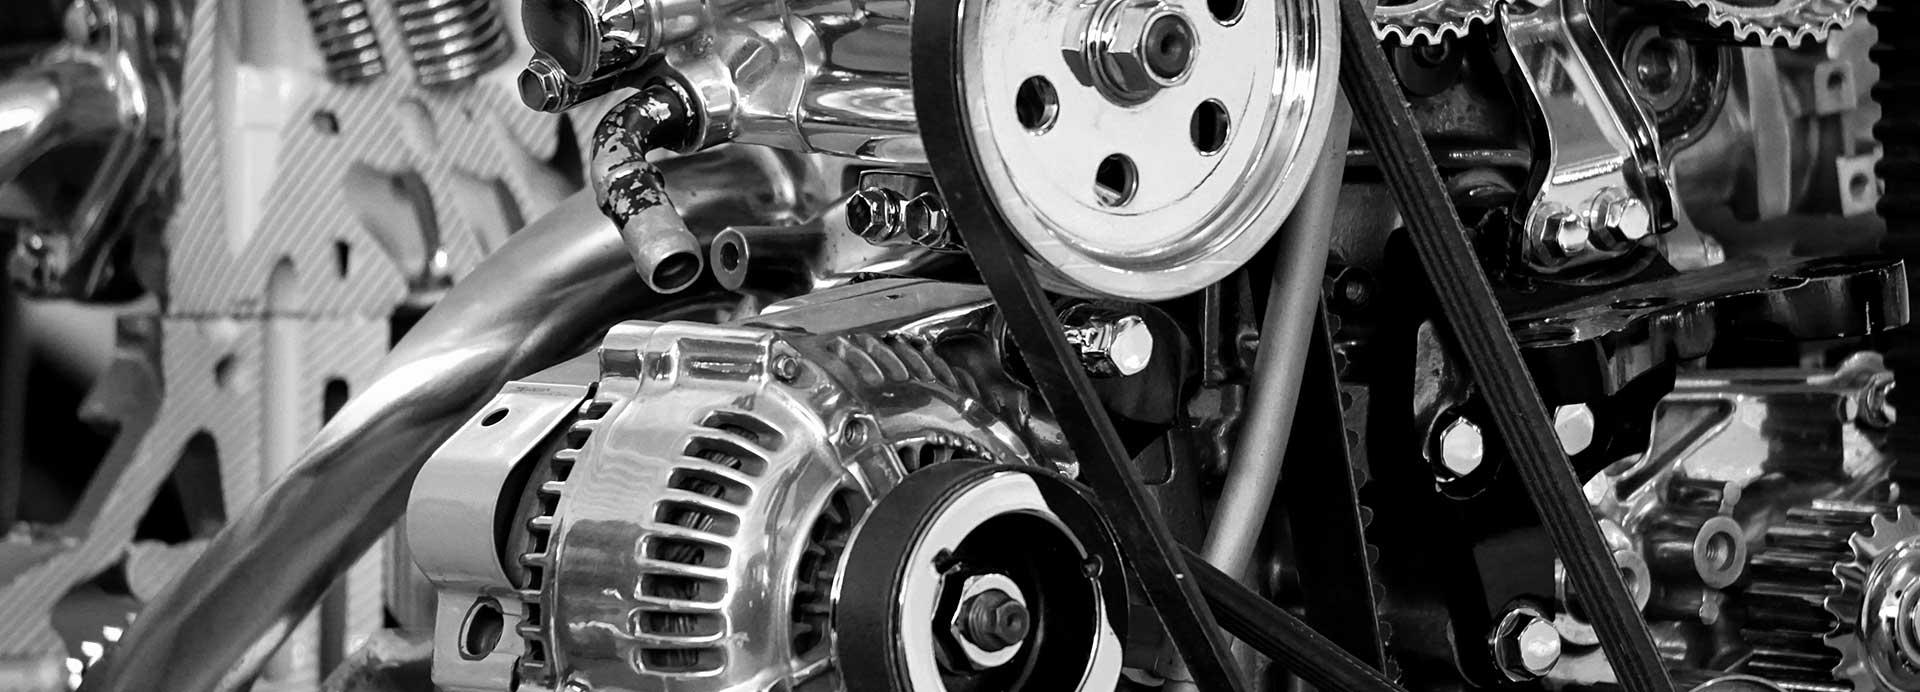 Fachübersetzung Maschinenbau Engineering Maschine Motor